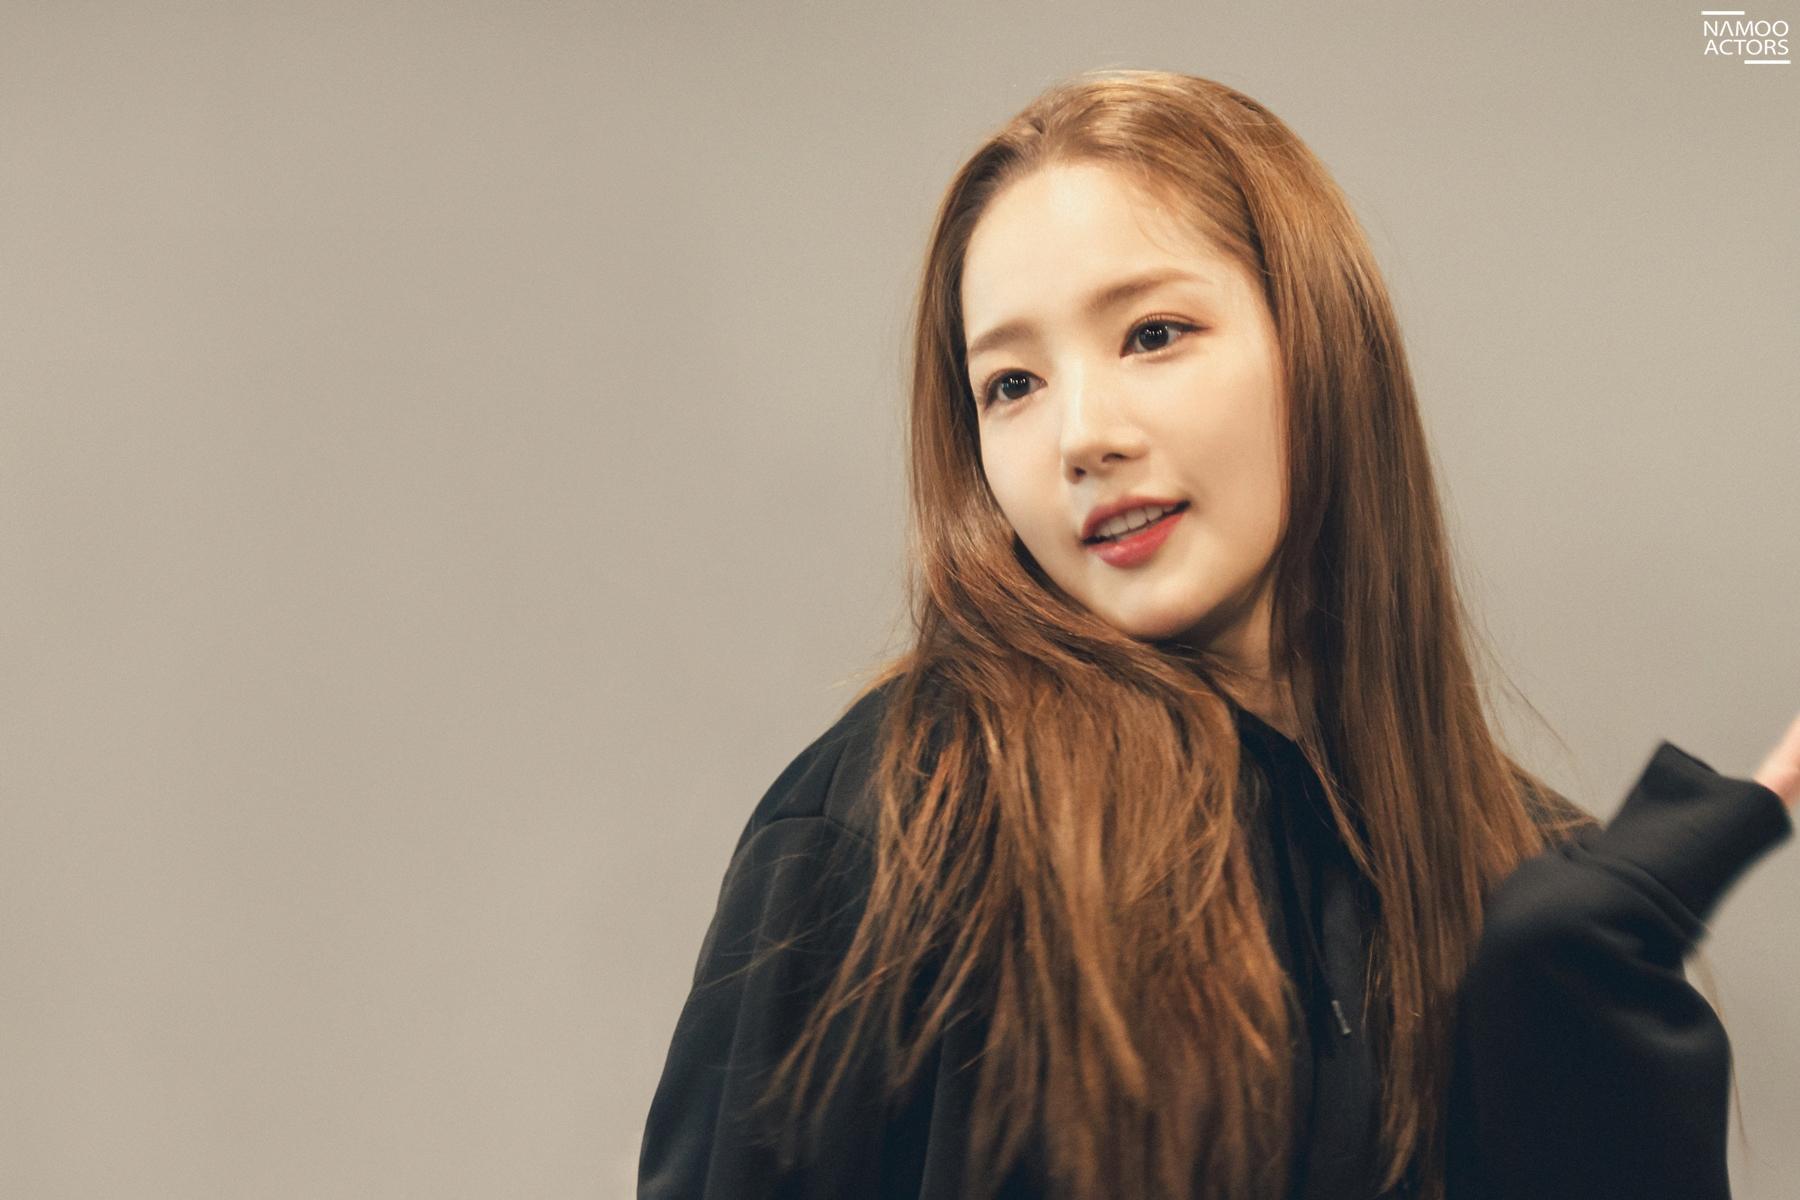 hottest actors, hottest actresses, 2018 actors, park minyoung